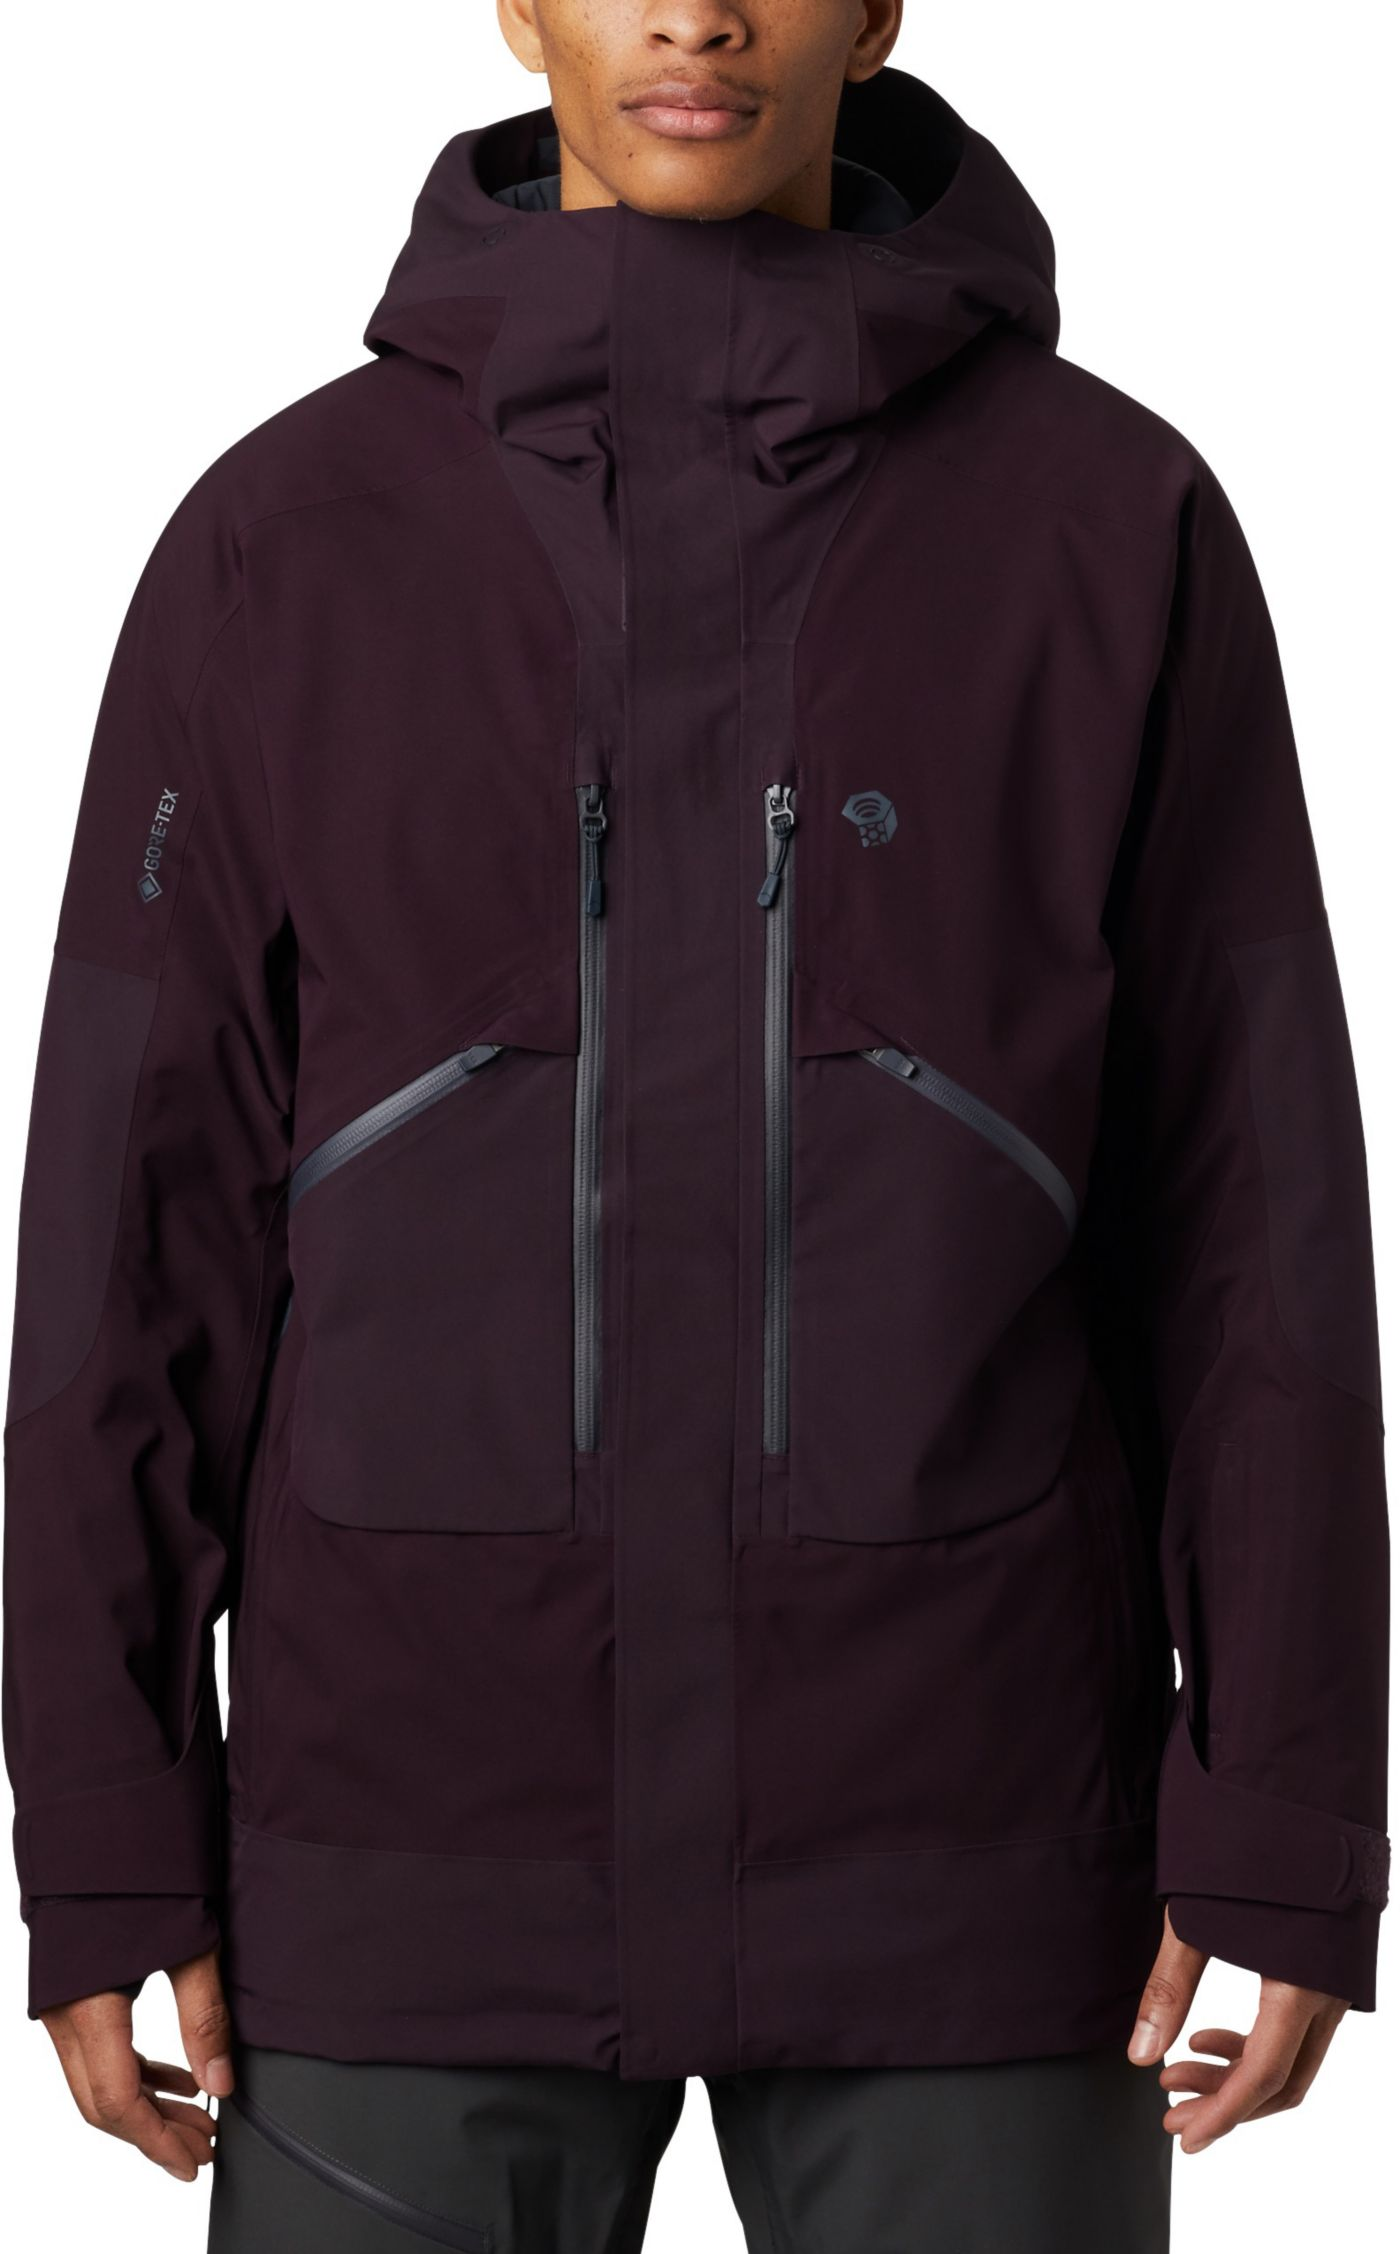 Mountain Hardwear Men's Cloud Bank Gore-Tex Insulated Jacket